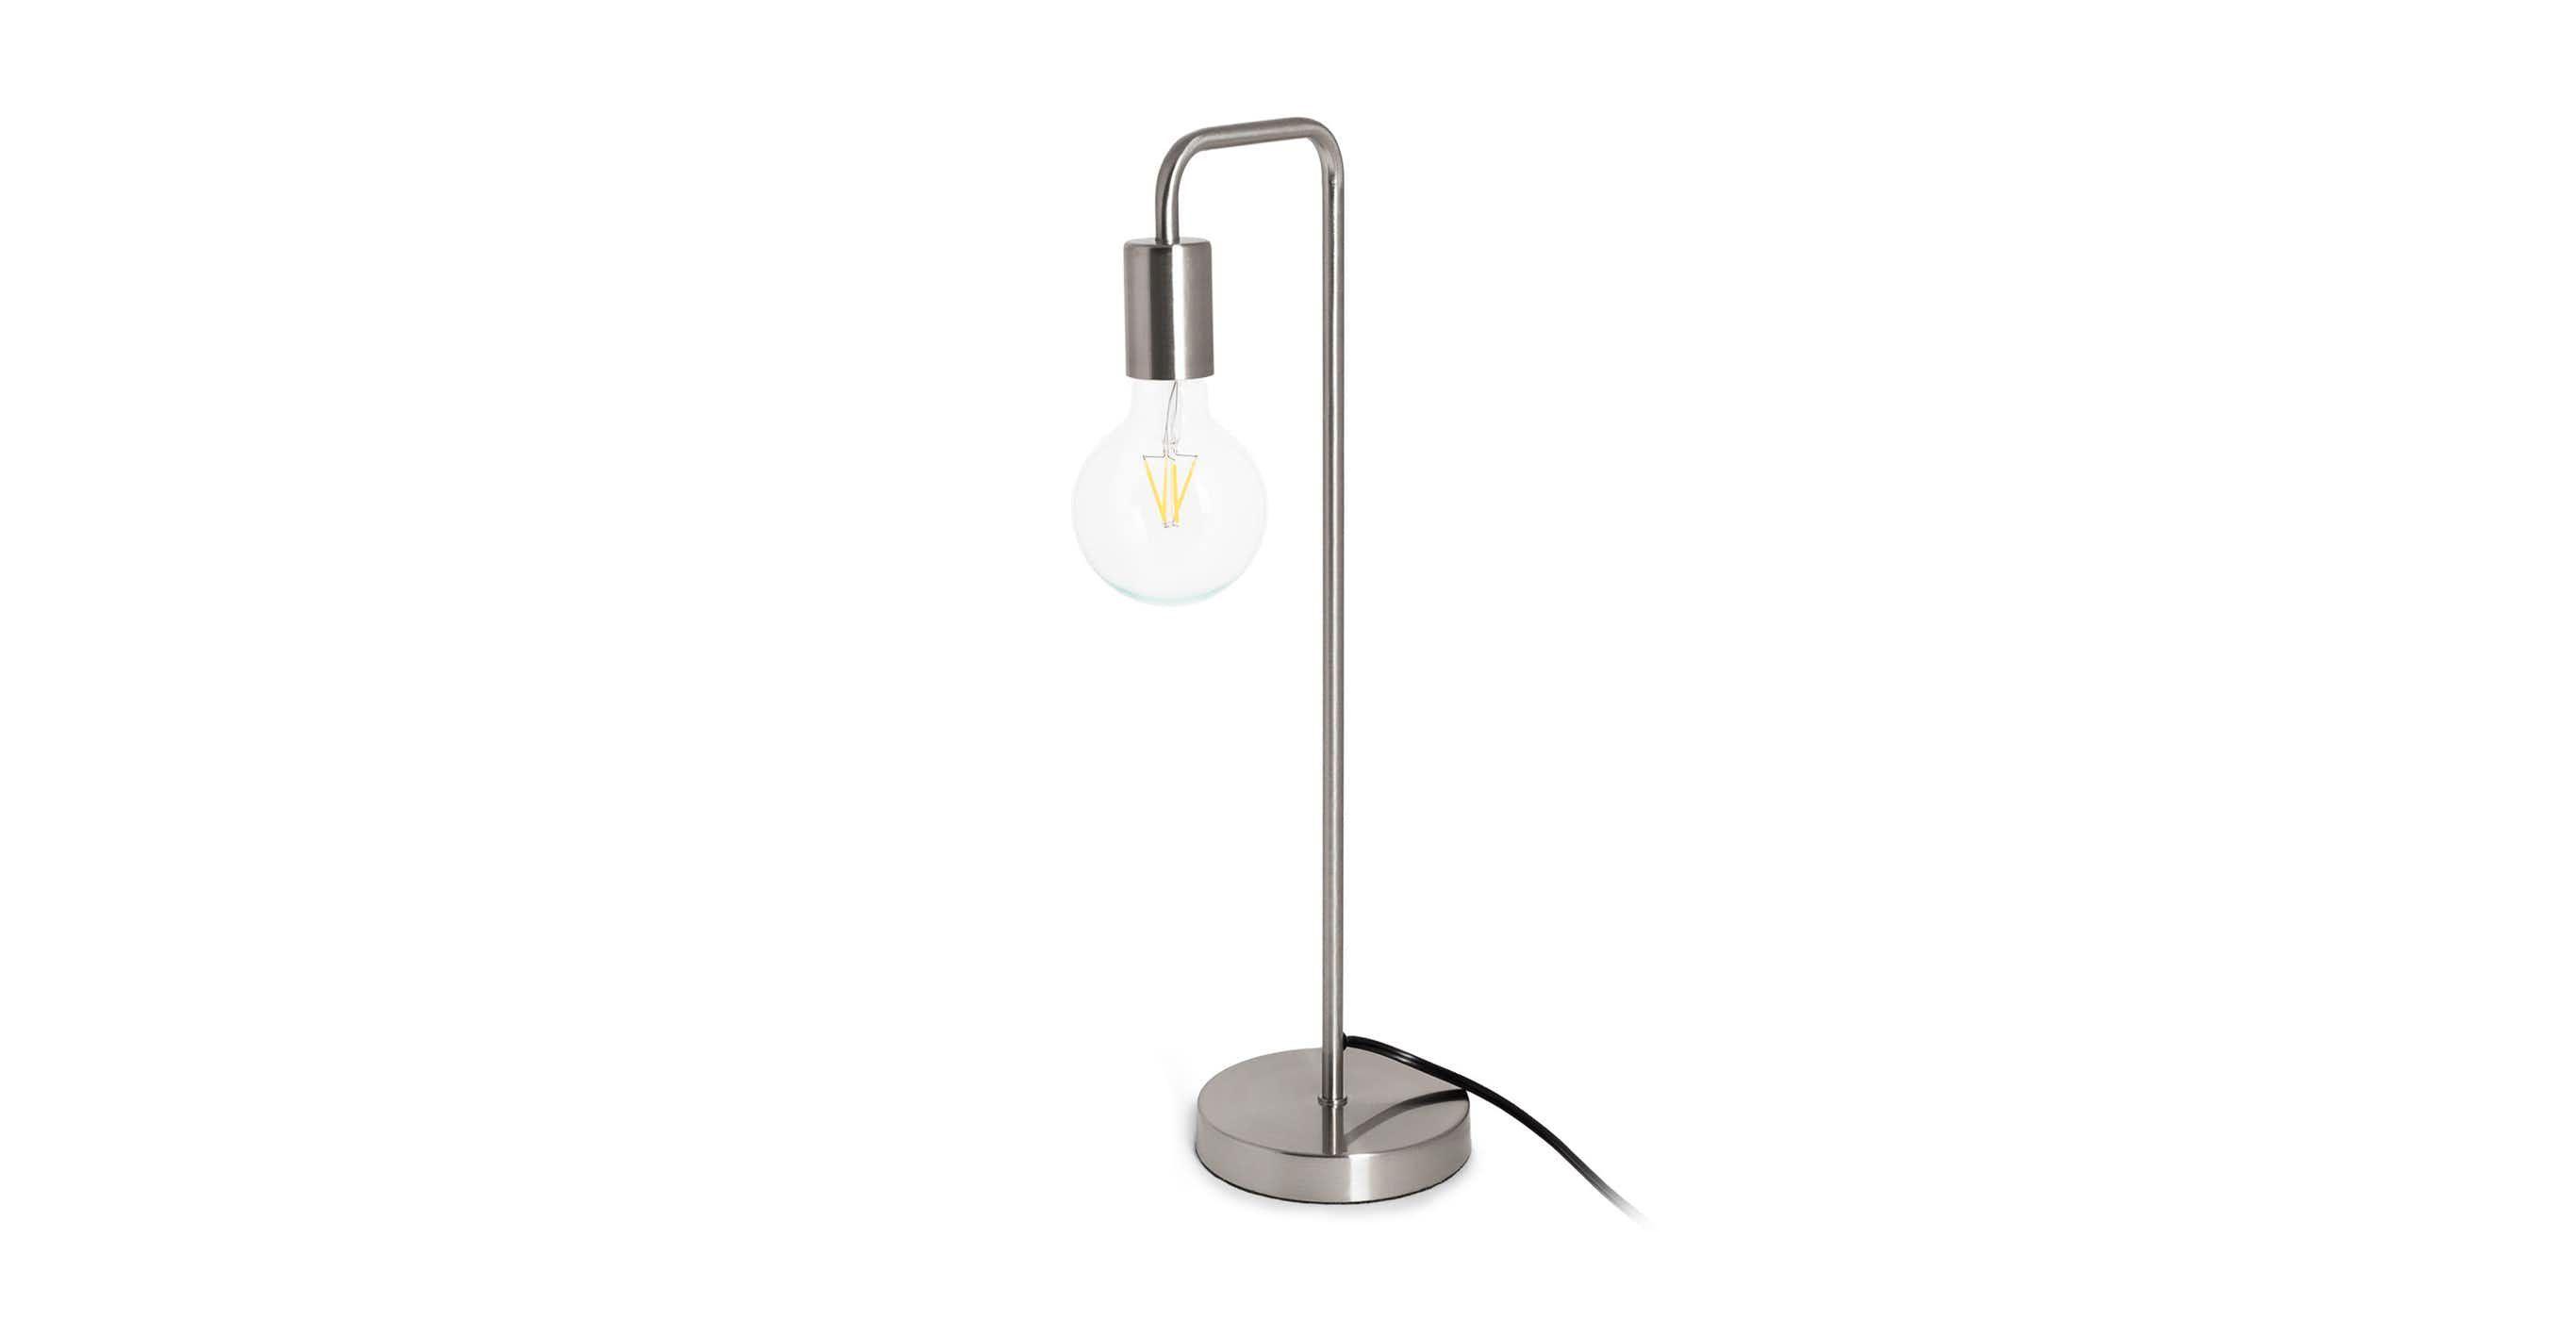 Beacon Nickel Table Lamp Nickel Table Lamps Copper Floor Lamp Lamp